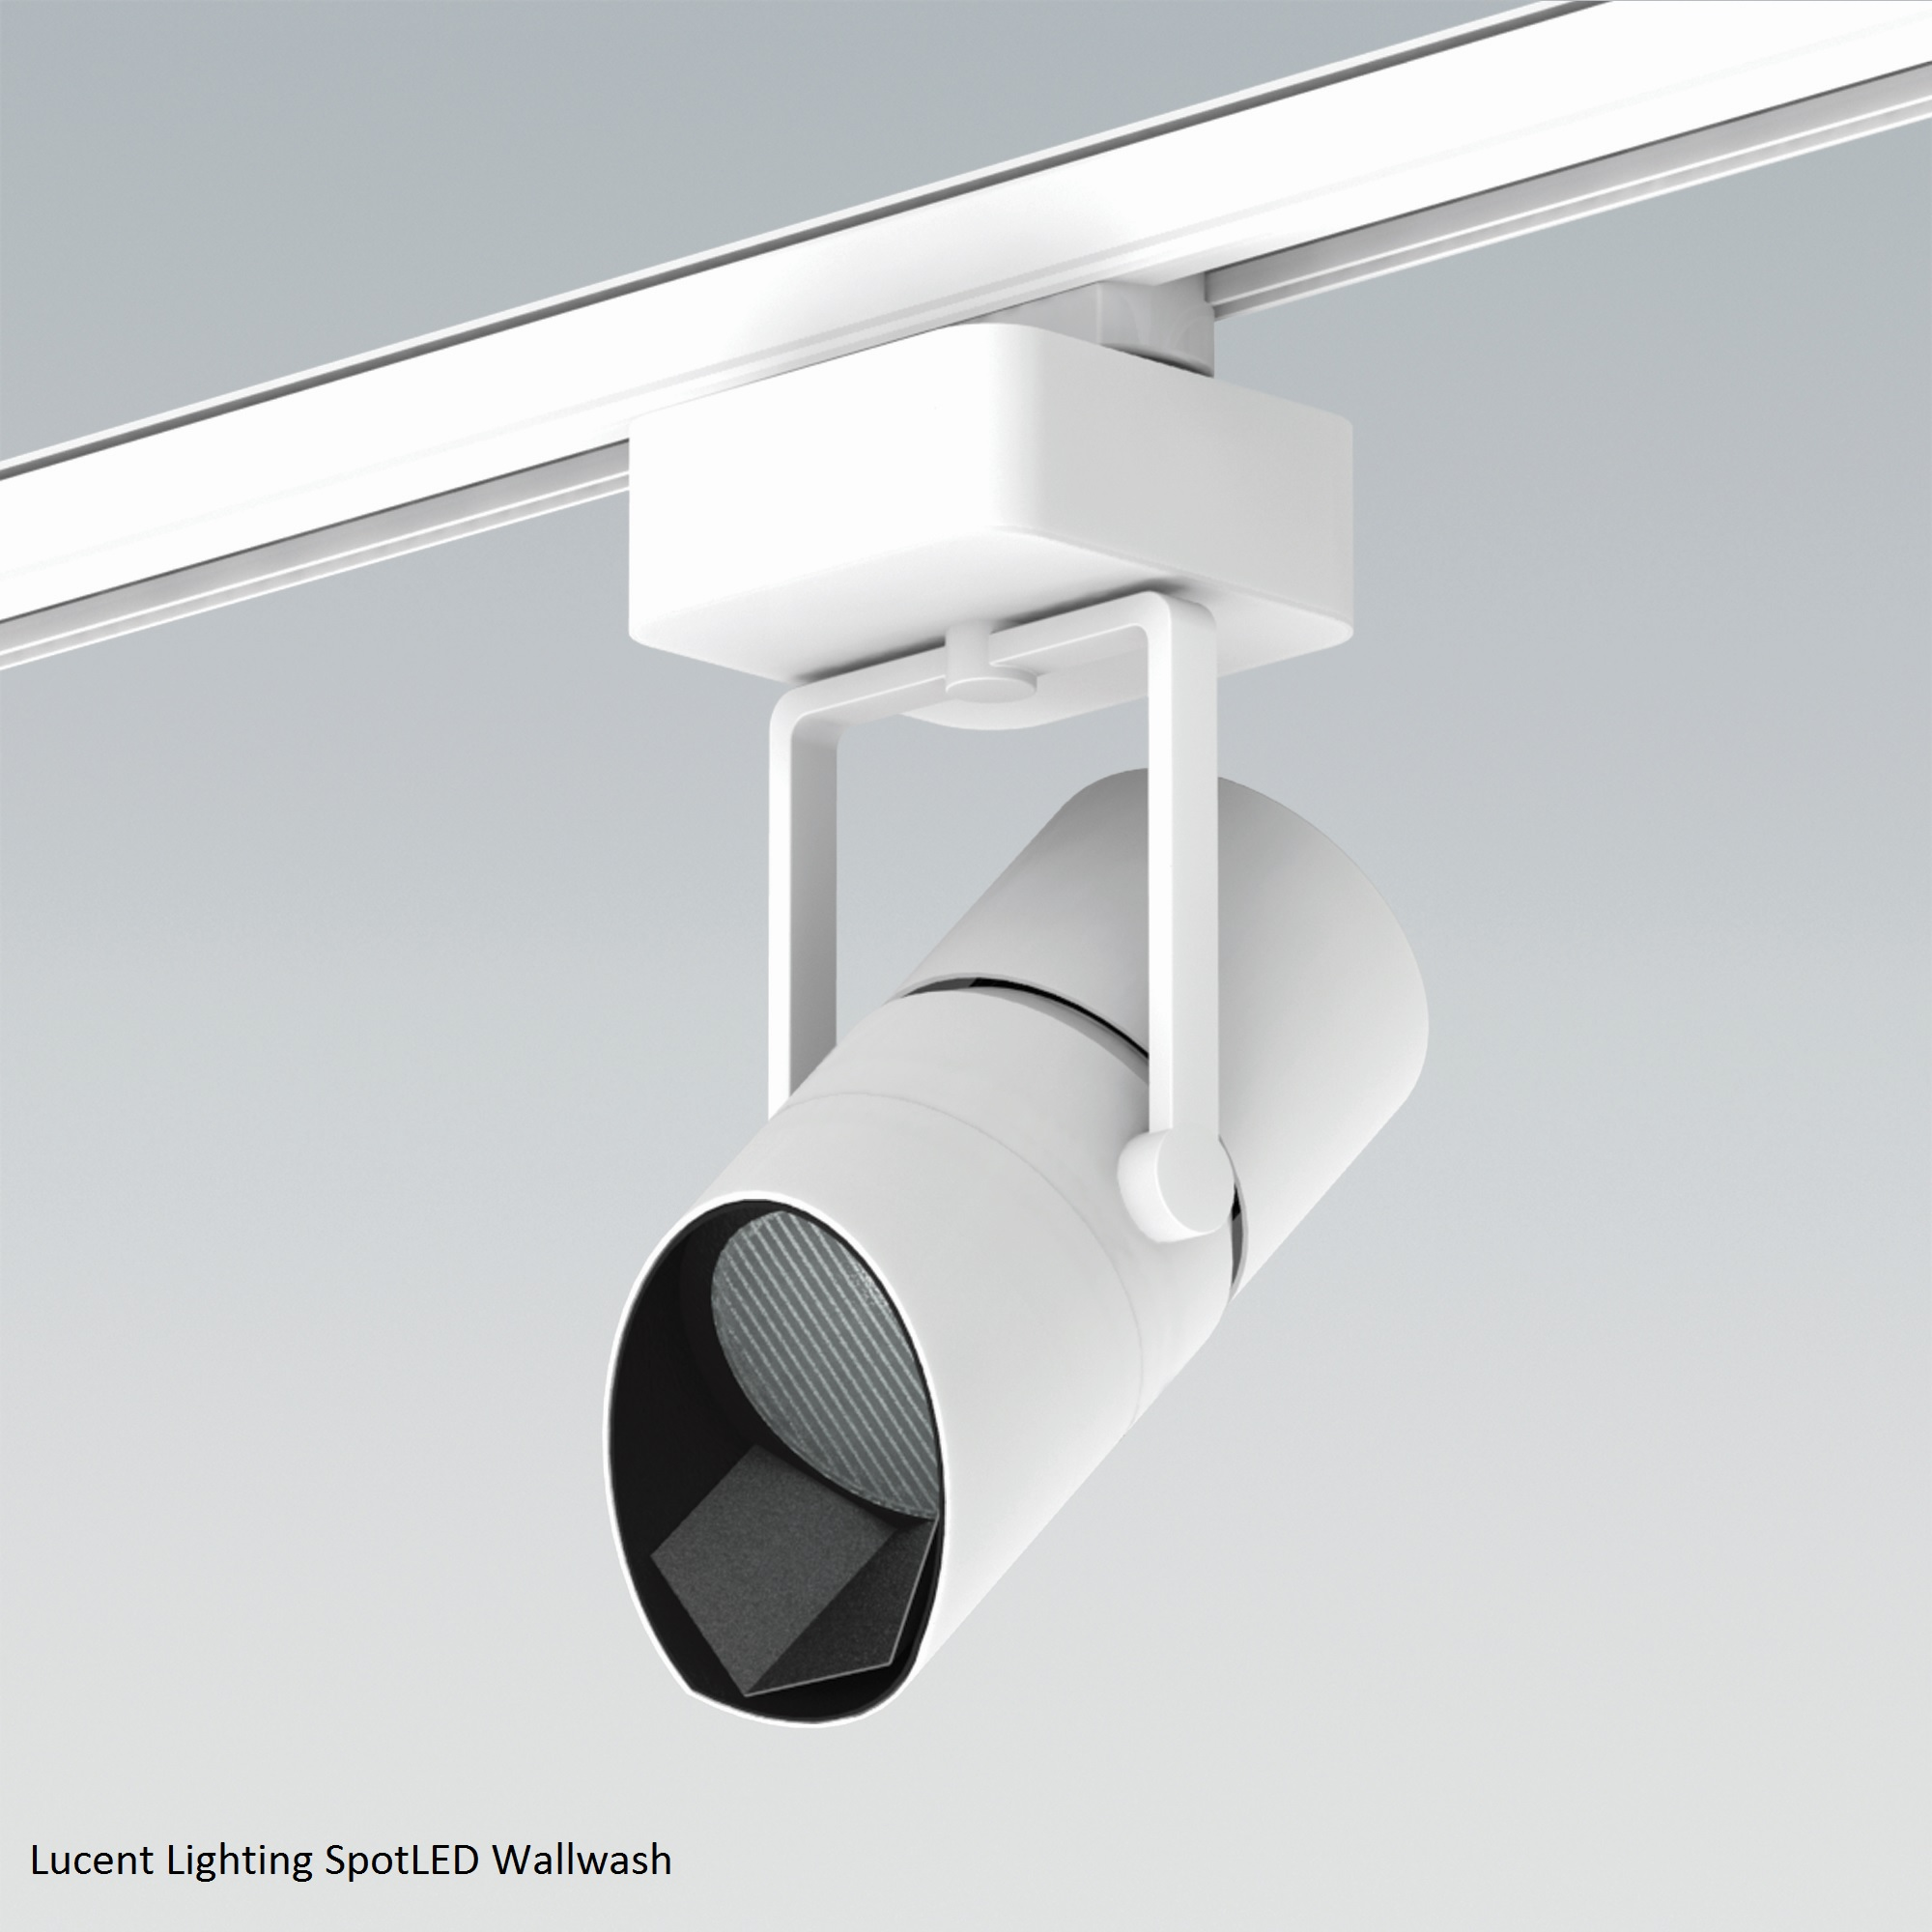 lucent-lighting-spotled-wallwash